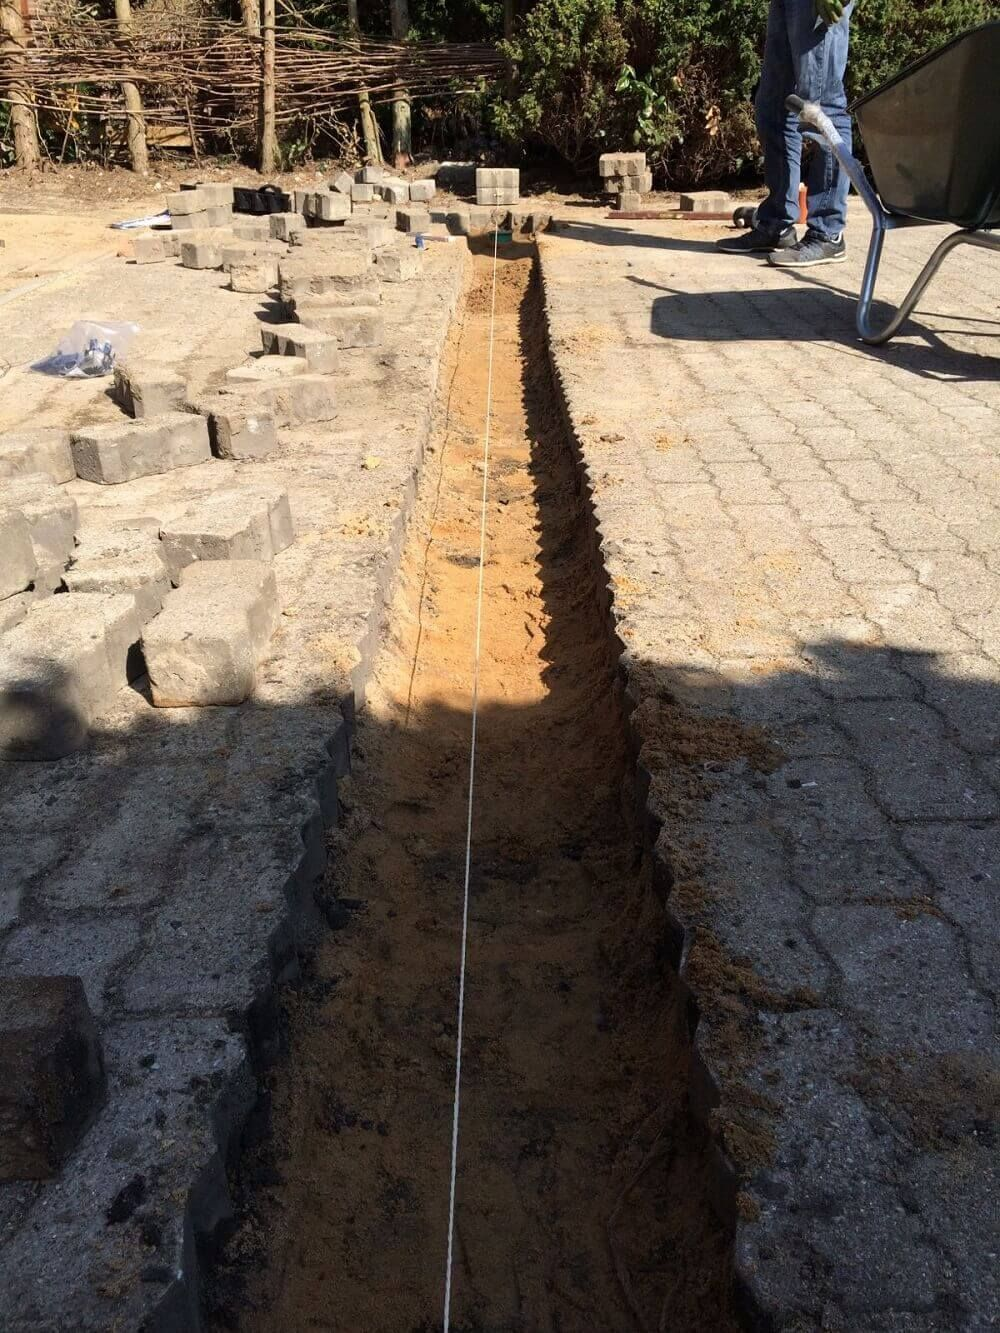 Extrem ACO Rinne - befahrbare Entwässerungsrinne selber verlegt | Hausbau OU16